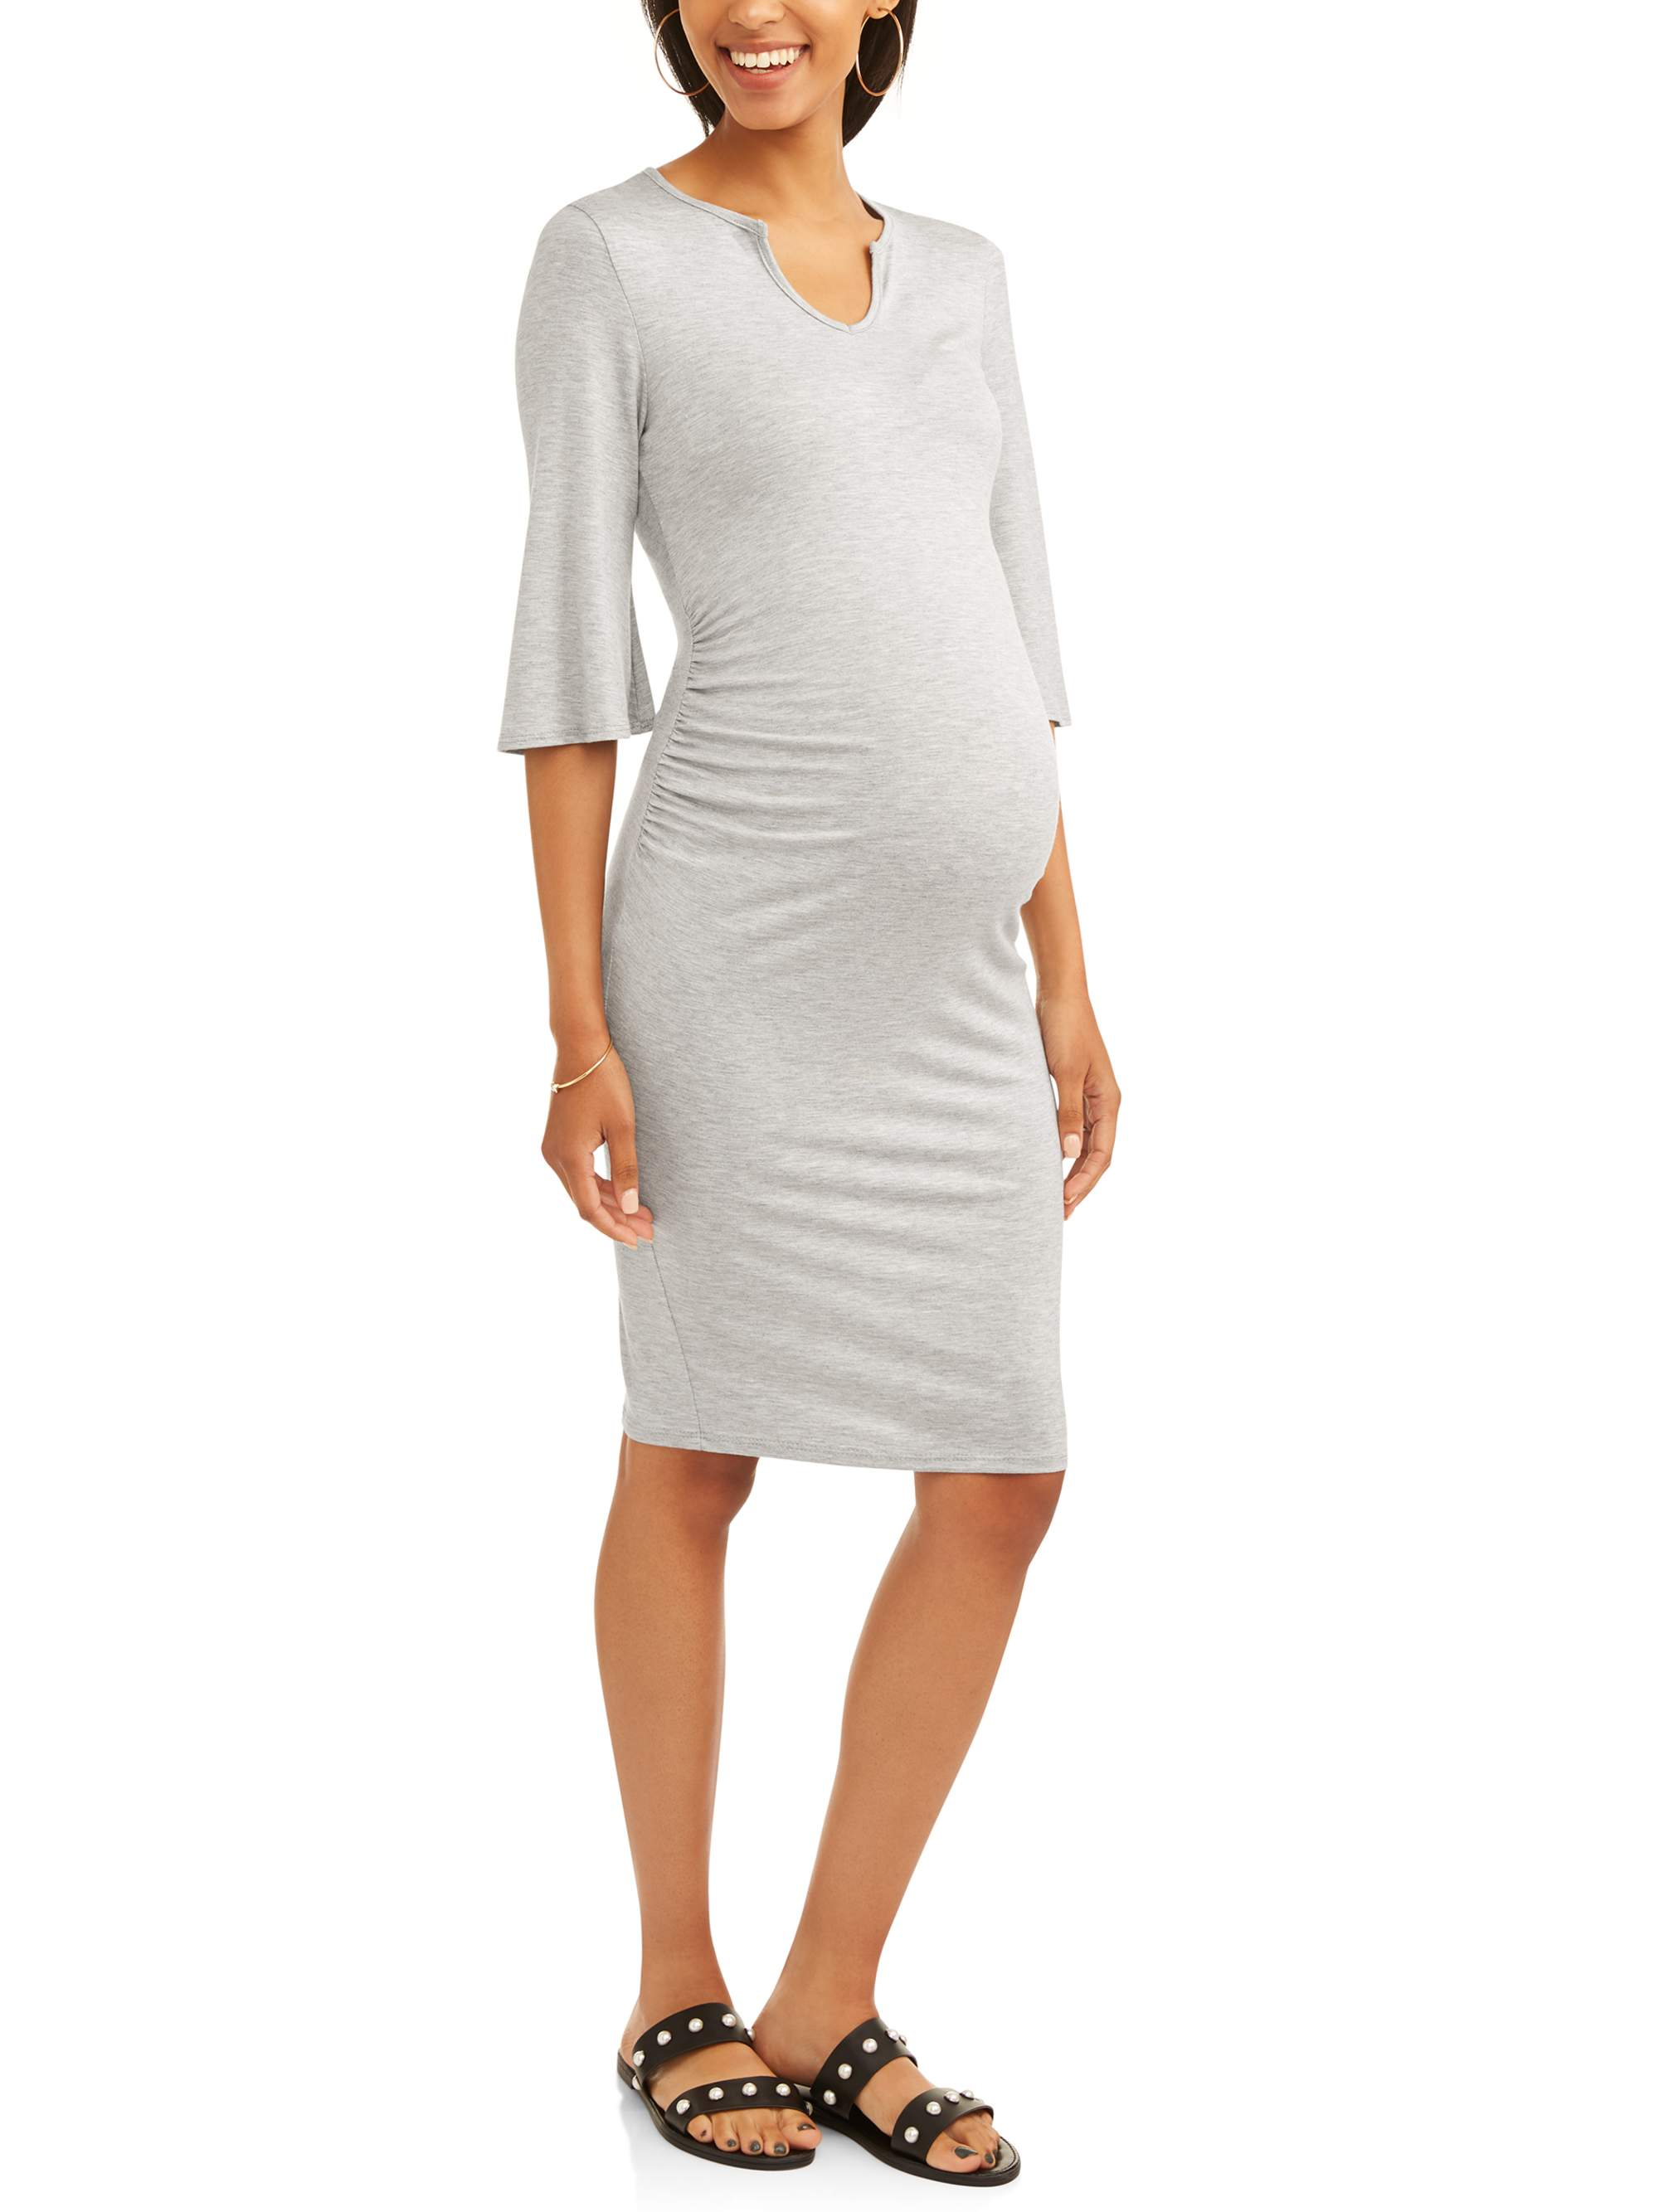 Maternity Bell Sleeve Midi Dress by Hot Shot Hk Llc